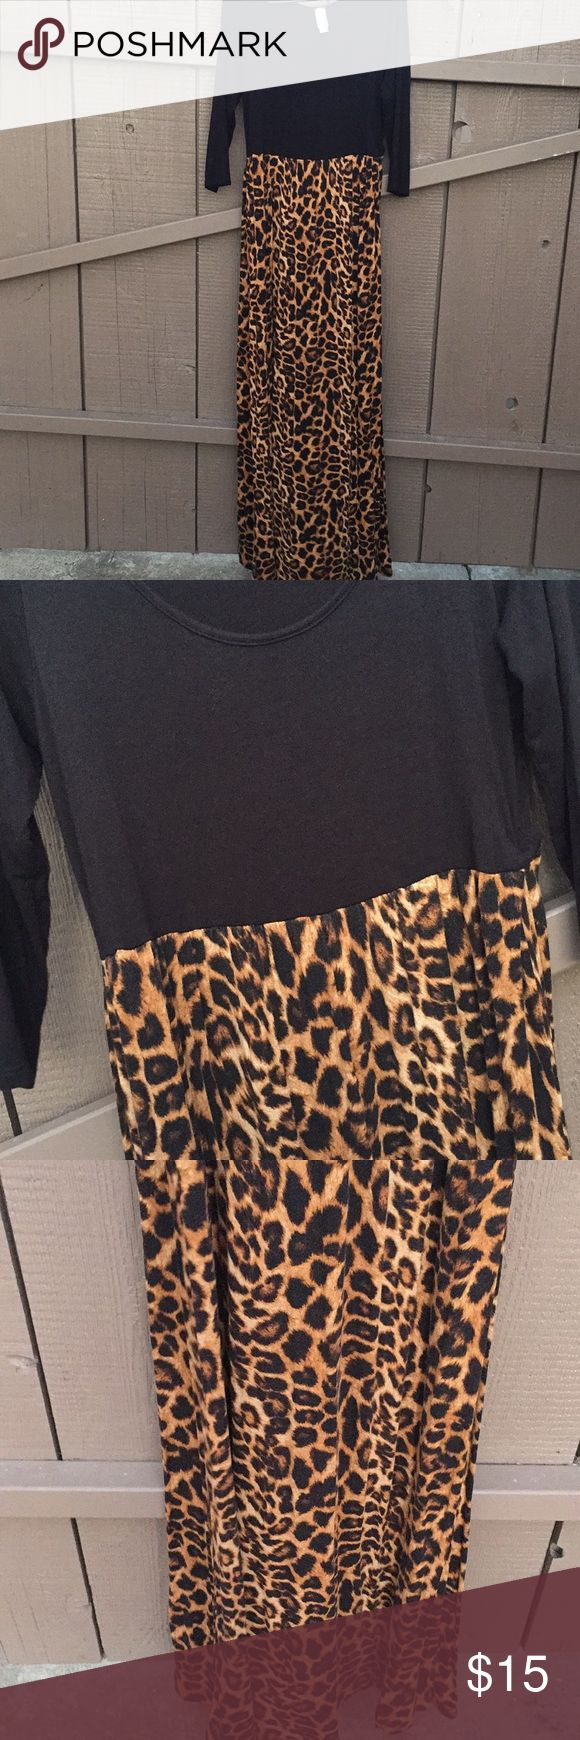 Leopard Maxi Dress Leopard Maxi Dress.  Size XL.  Good condition. GIDDY UP GLAMOUR Dresses Maxi